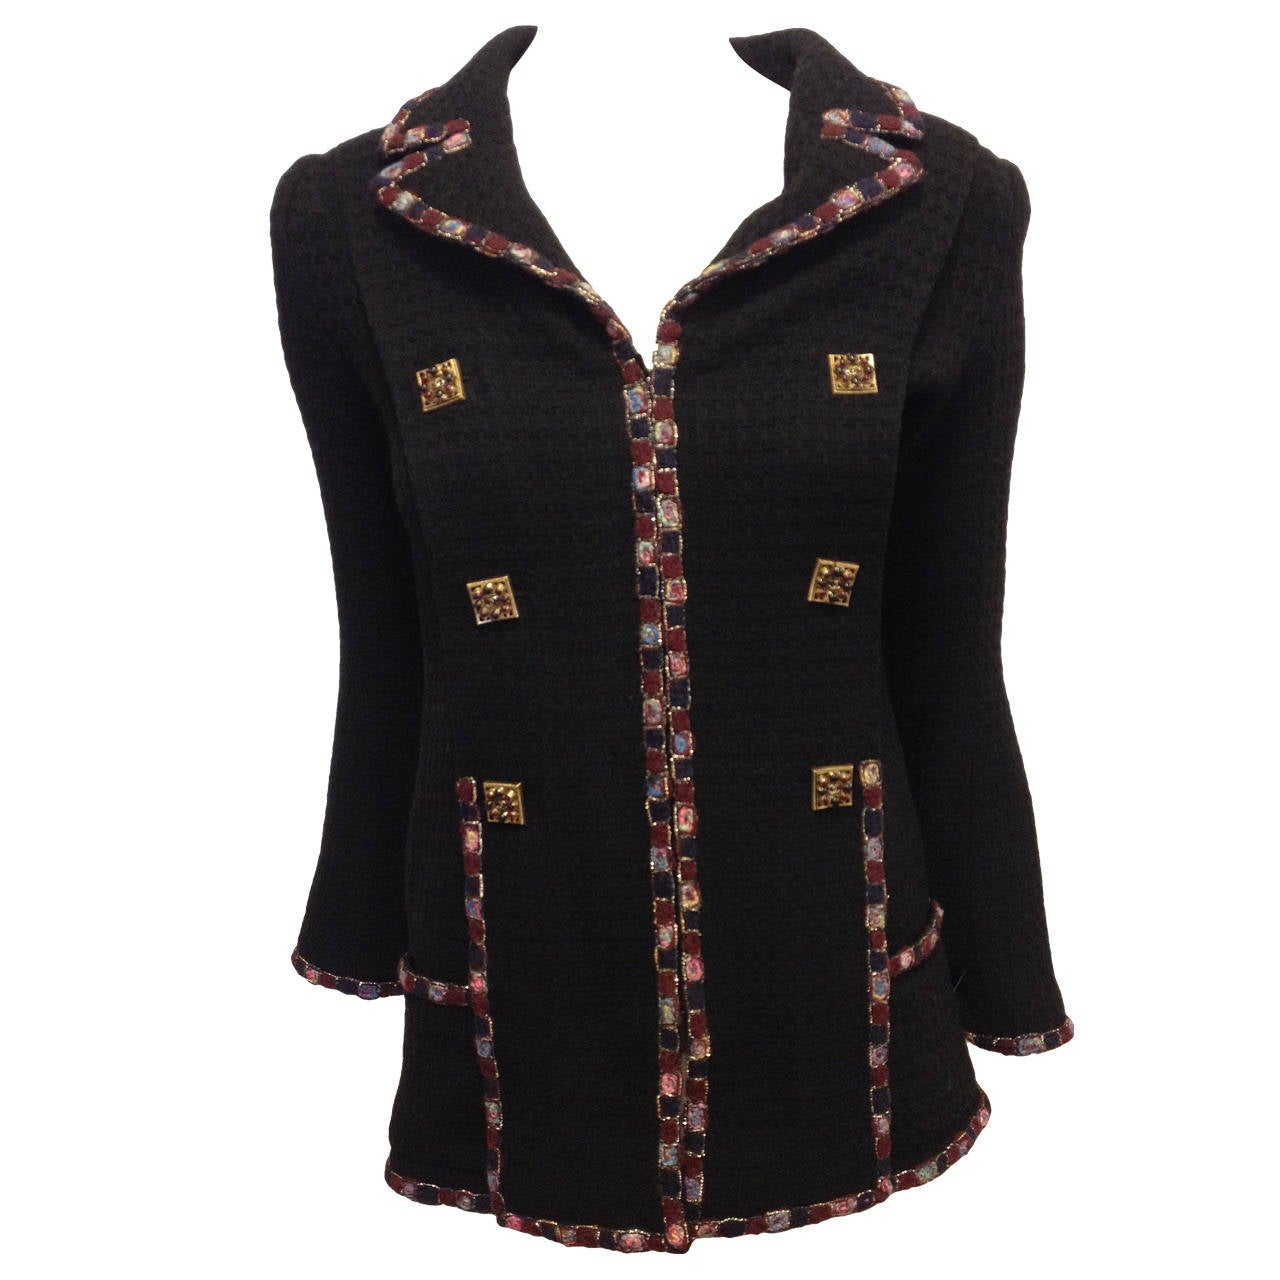 Chanel Black Jacket with Burgundy Trim at 1stdibs